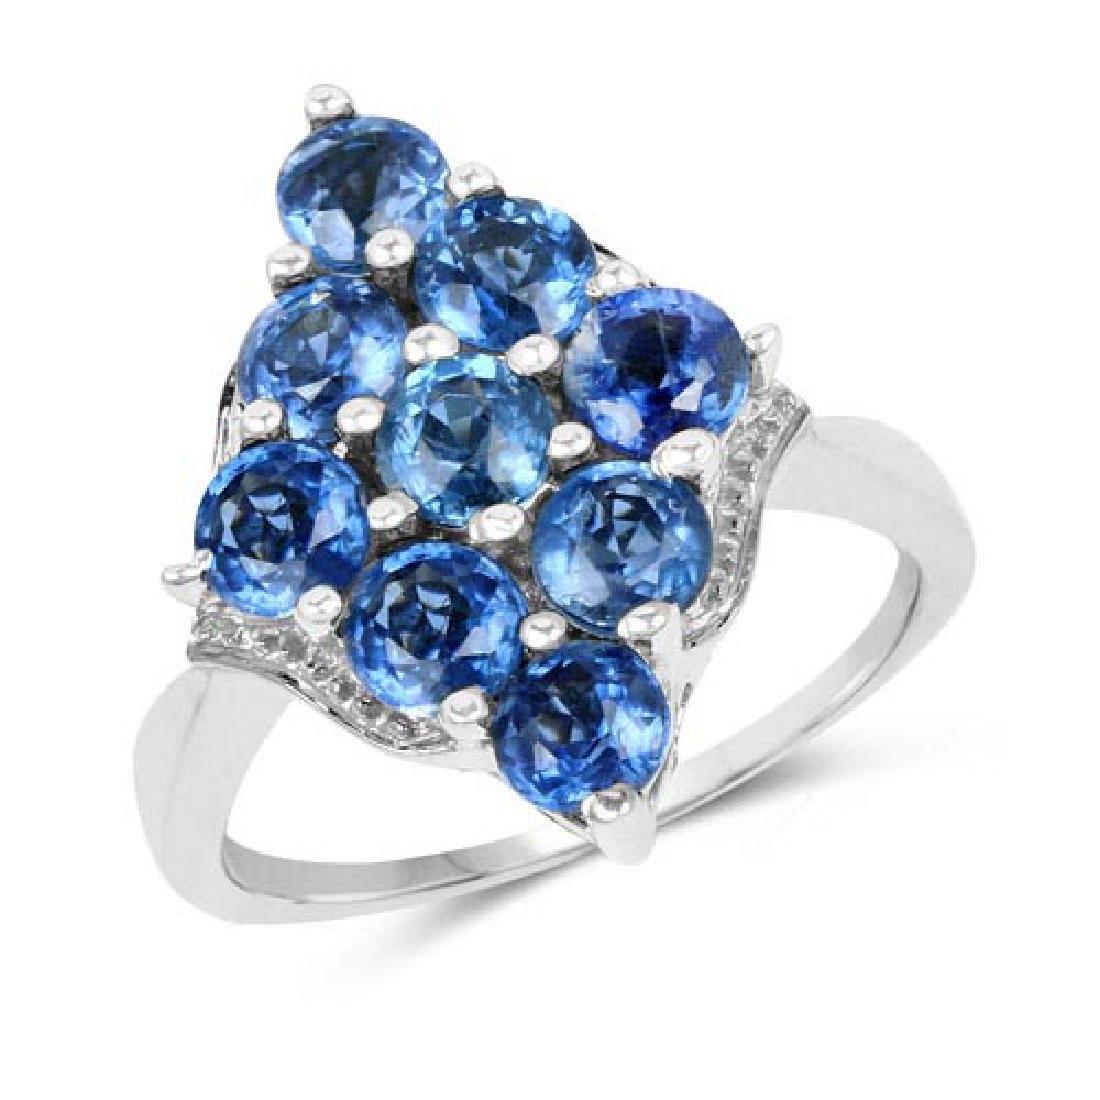 3.42 Carat Genuine Kyanite .925 Sterling Silver Ring